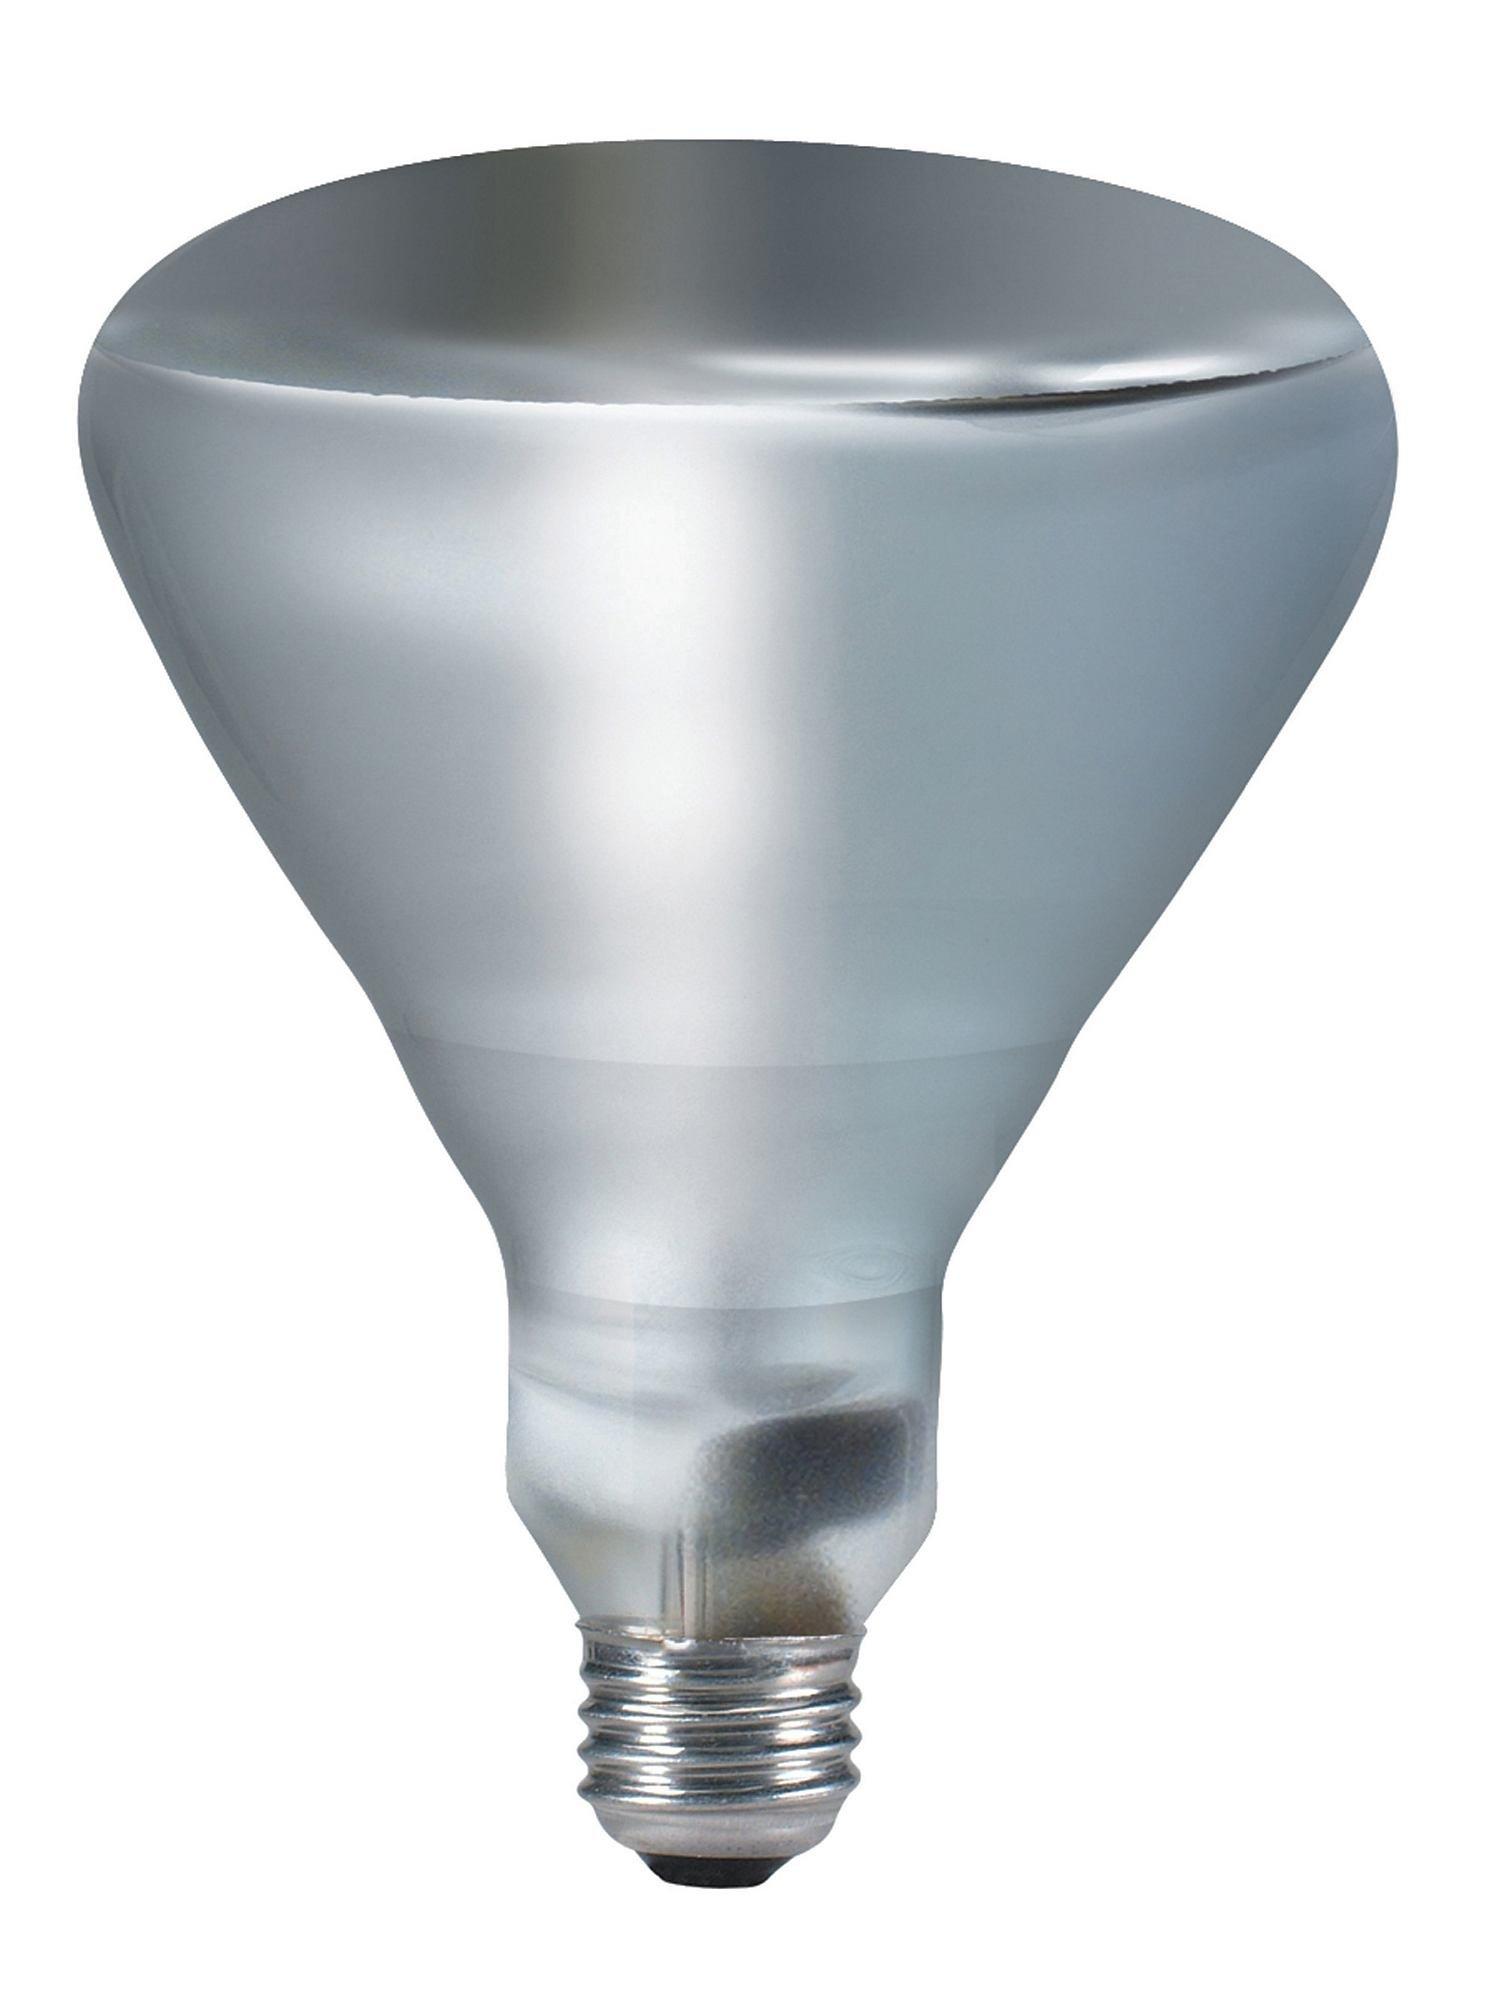 Philips 202051 250-watt BR40 TuffGuard Coated Heat Lamp Light Bulb